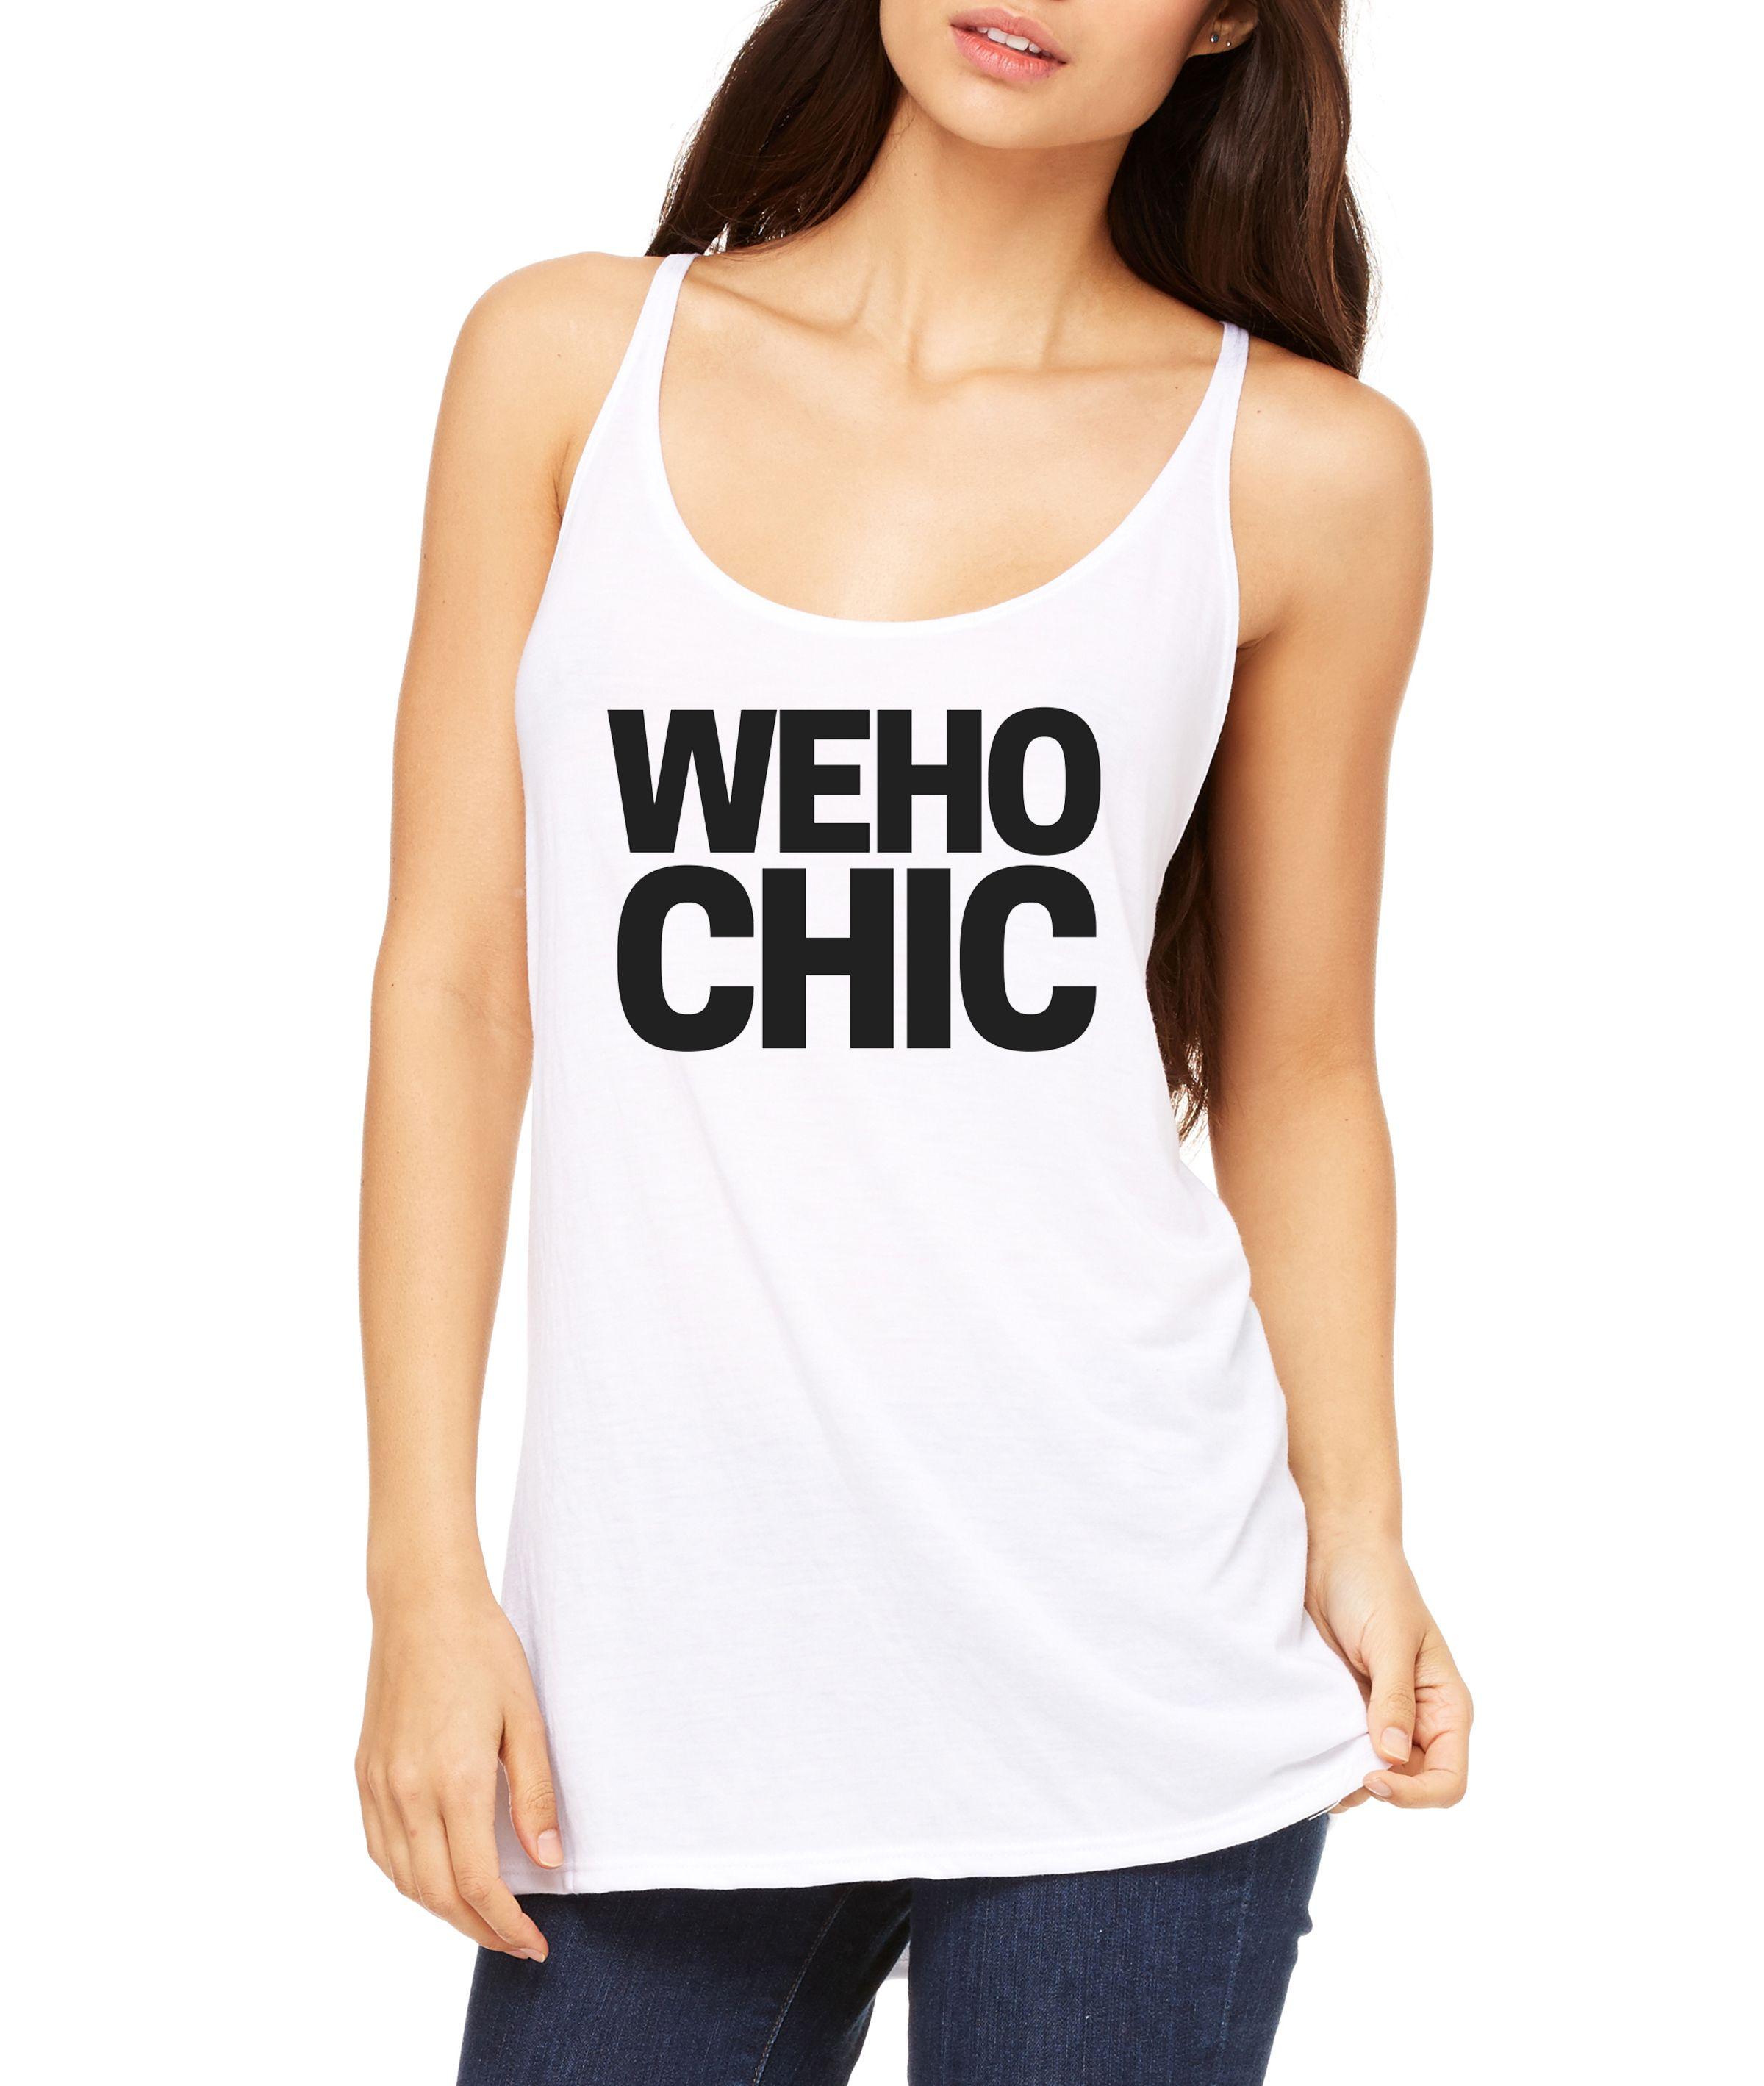 WeHo Chic Women's Slouchy Tank